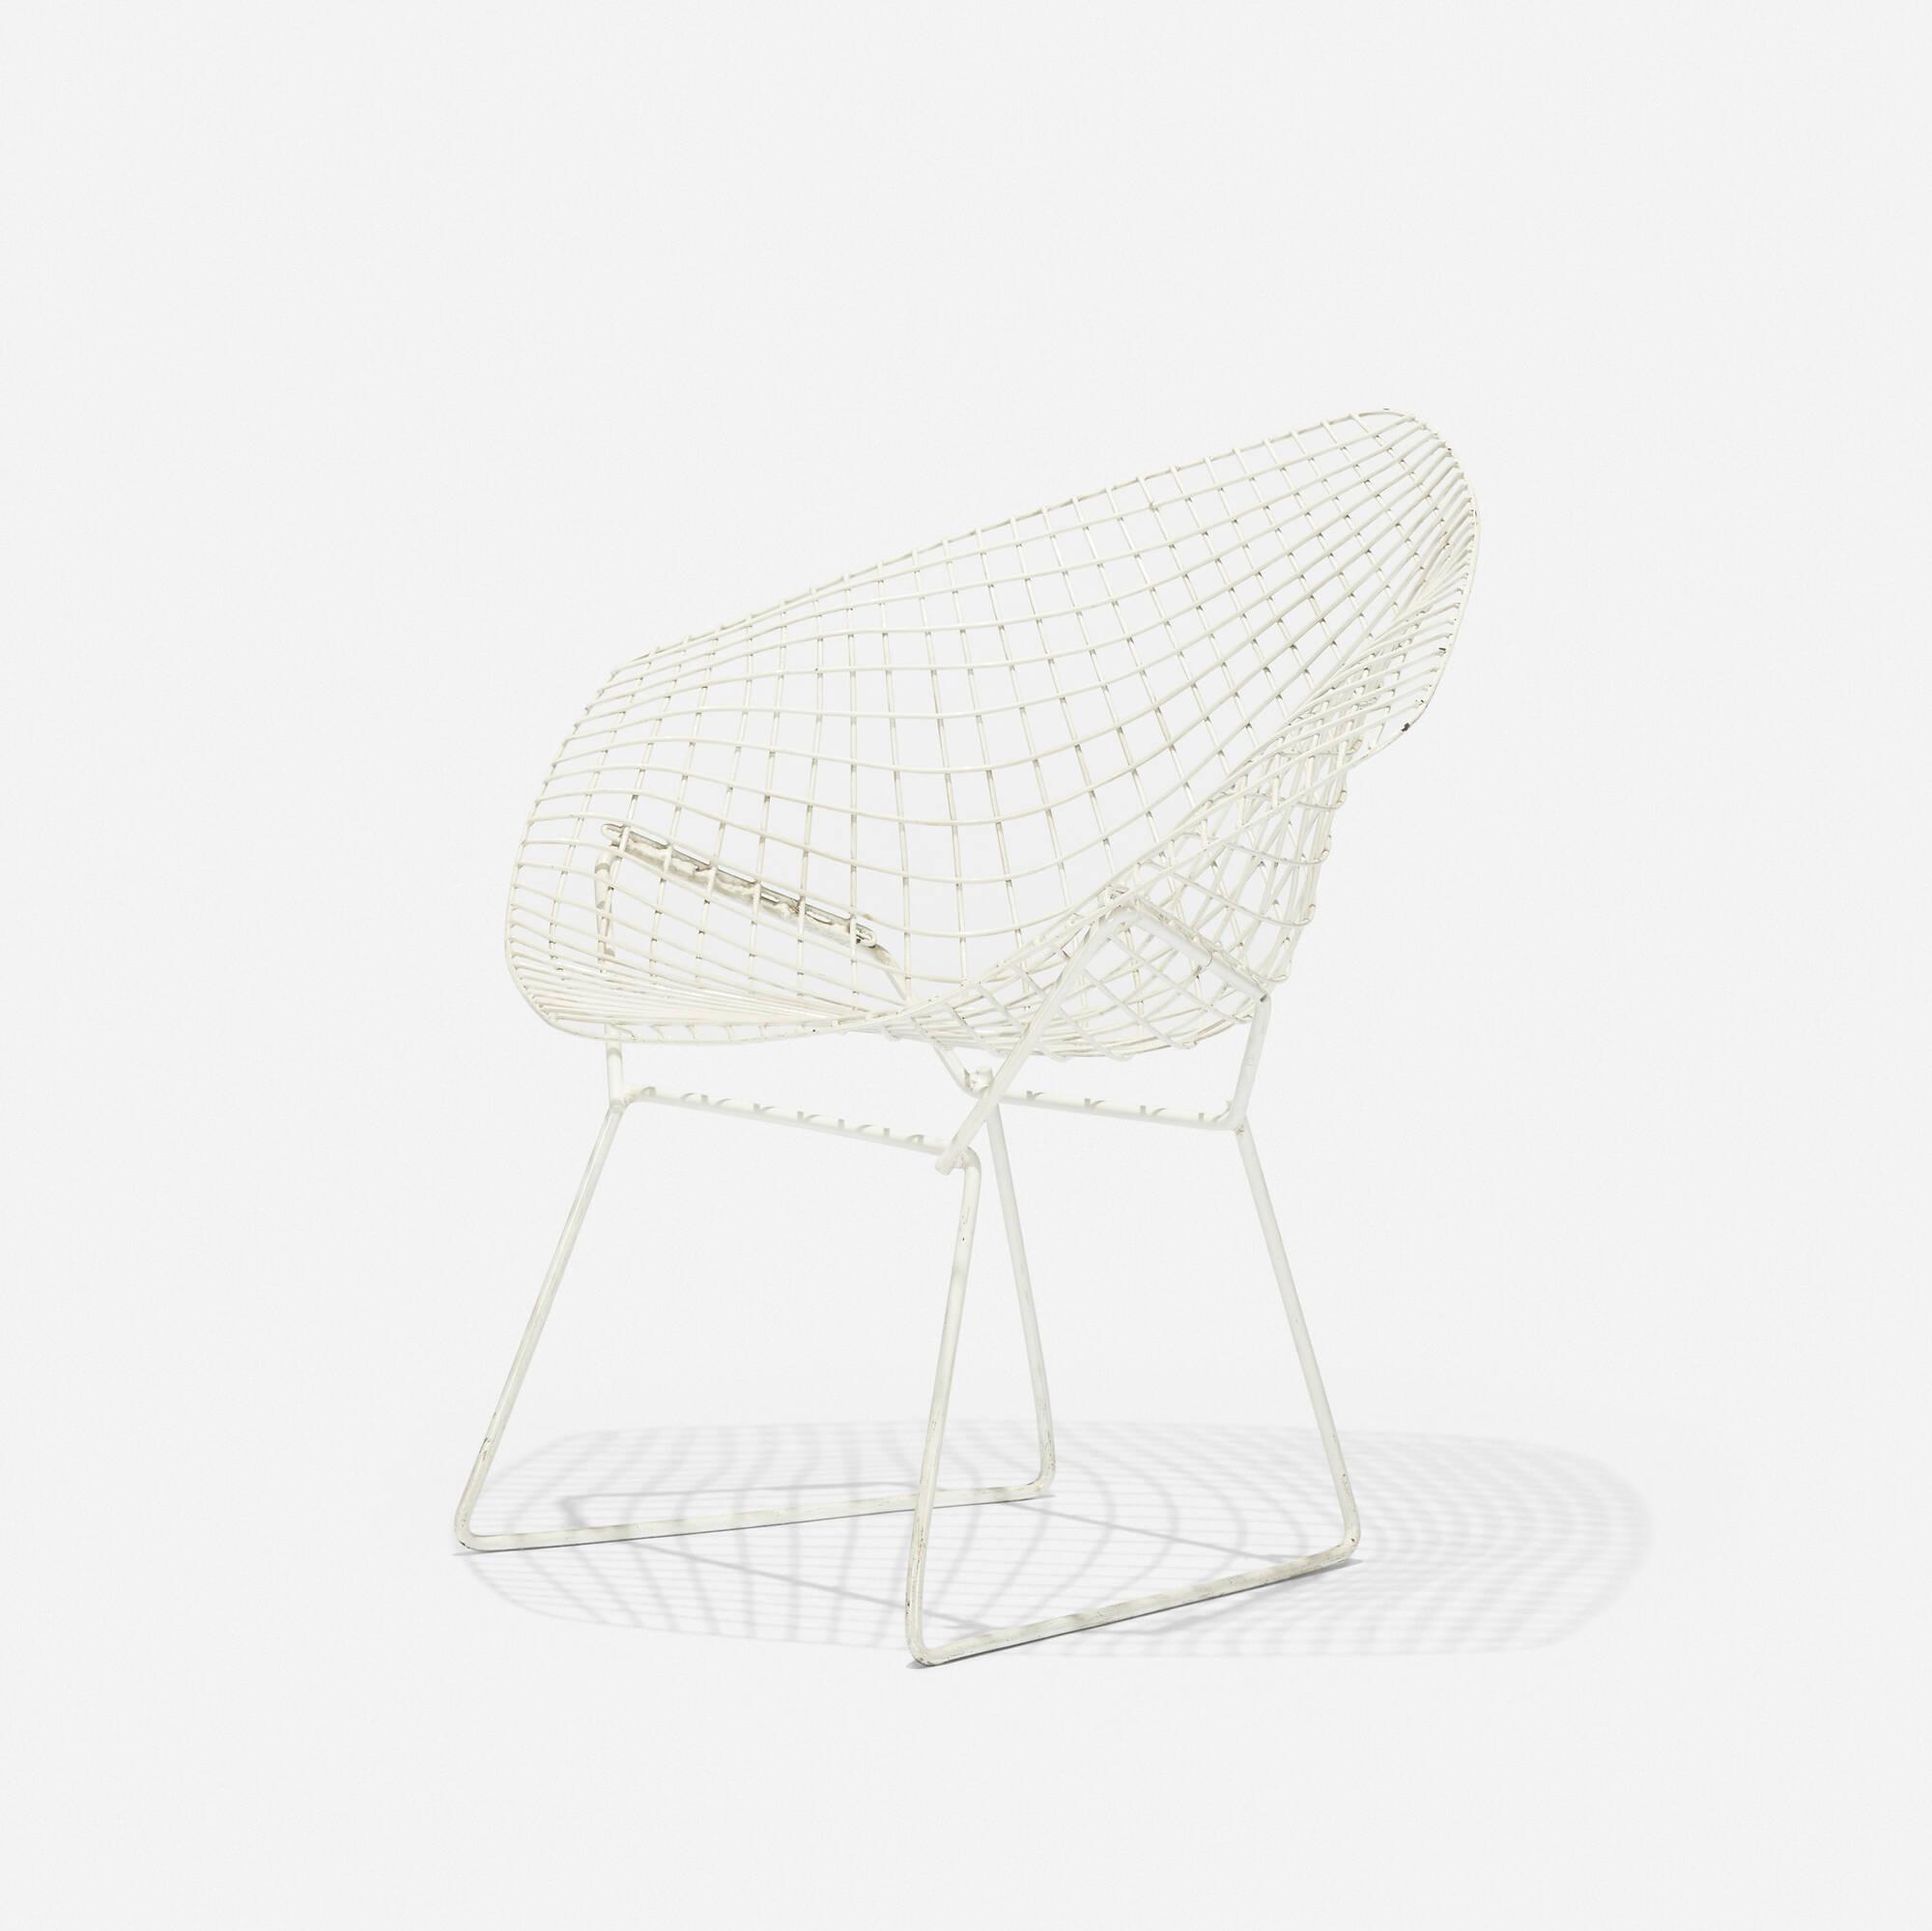 231: Harry Bertoia / Small Diamond chair (2 of 3)